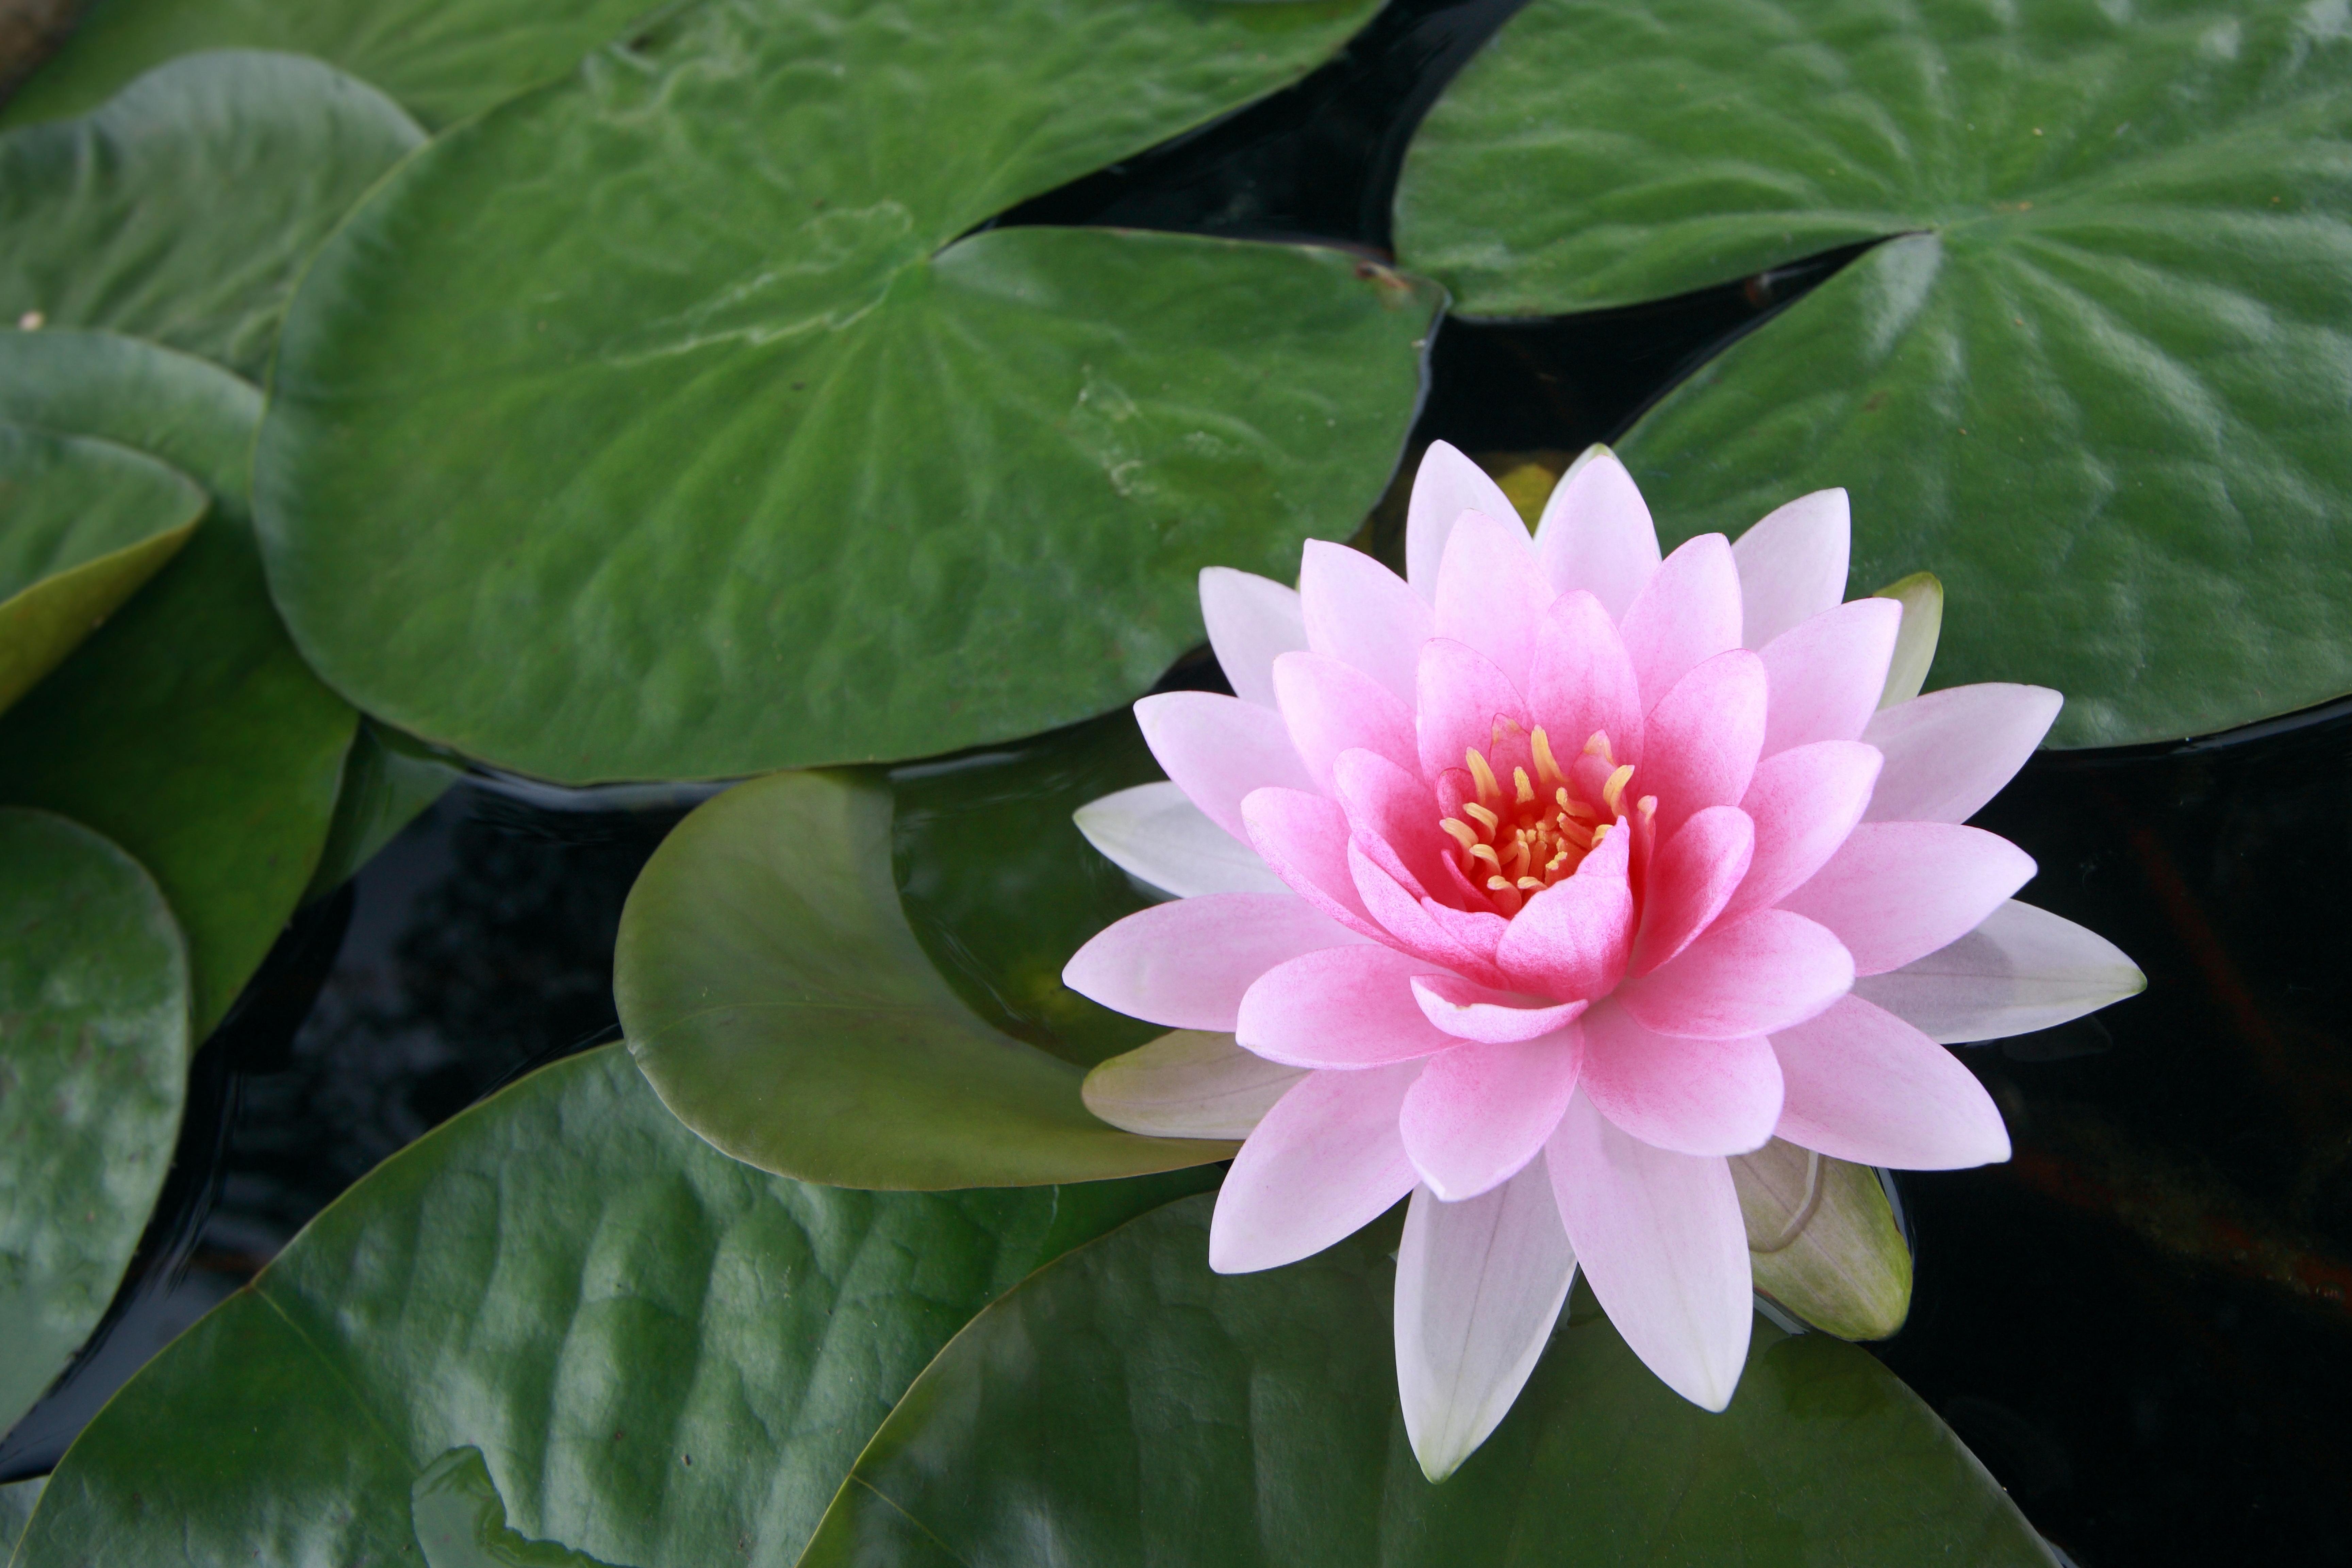 фото картинки фото цветка лотос пунктирных линий разовьют